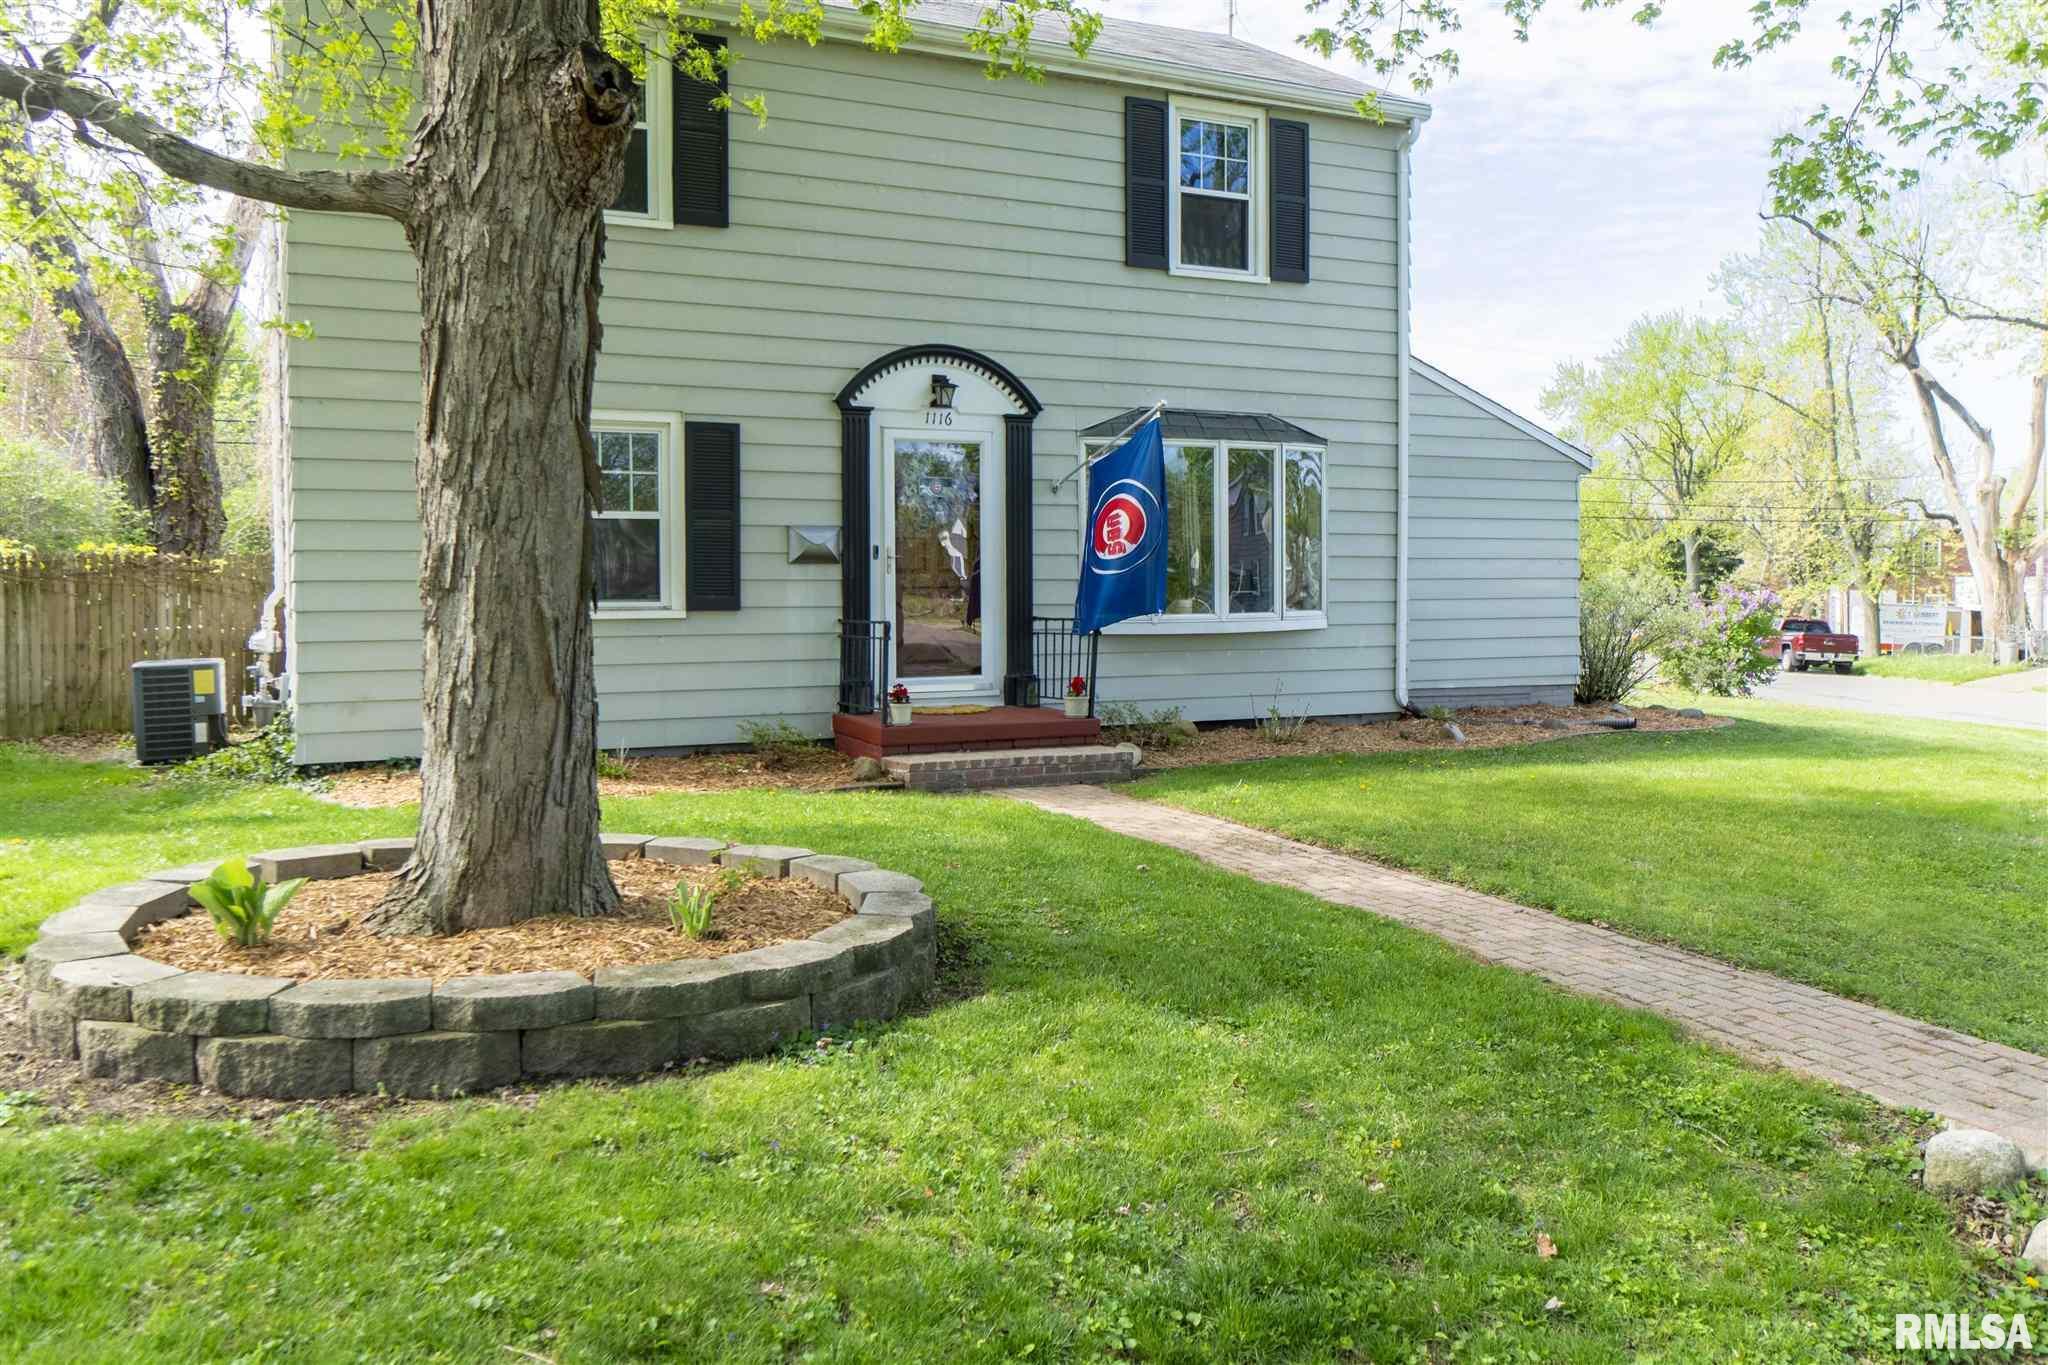 1116 E ELMHURST Property Photo - Peoria, IL real estate listing